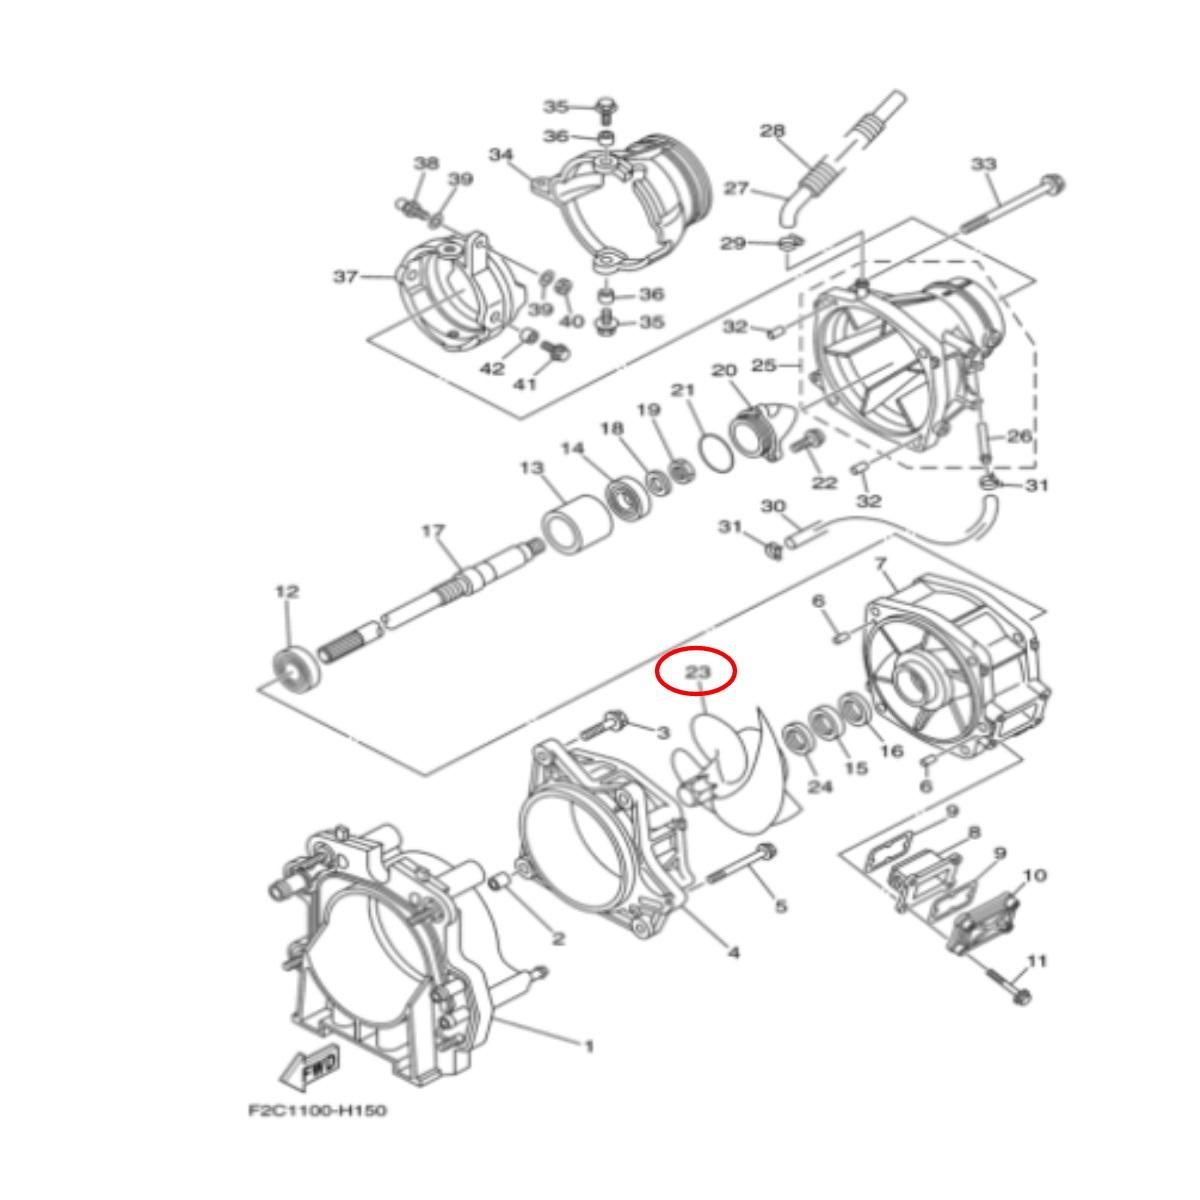 Hélice Solas para Jet Ski Yamaha VXR/VXS/SHO 13/19  - Radical Peças - Peças para Jet Ski